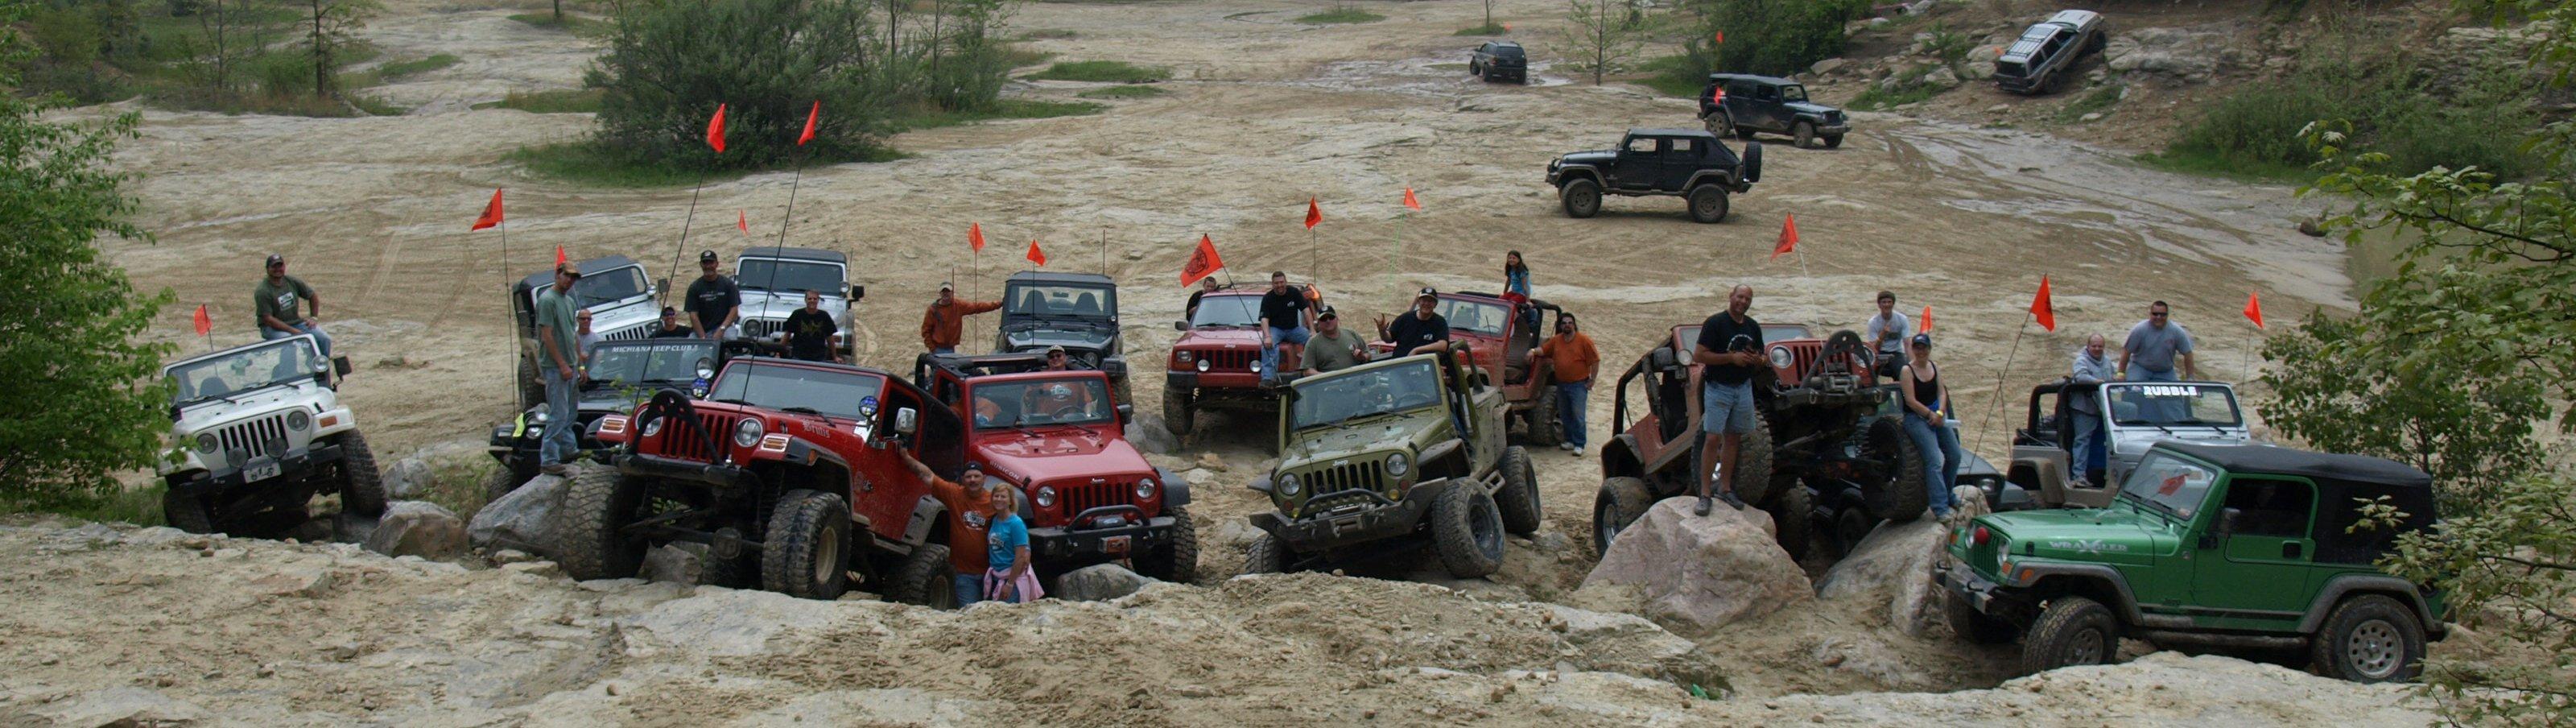 Michiana Jeep Club Home Page